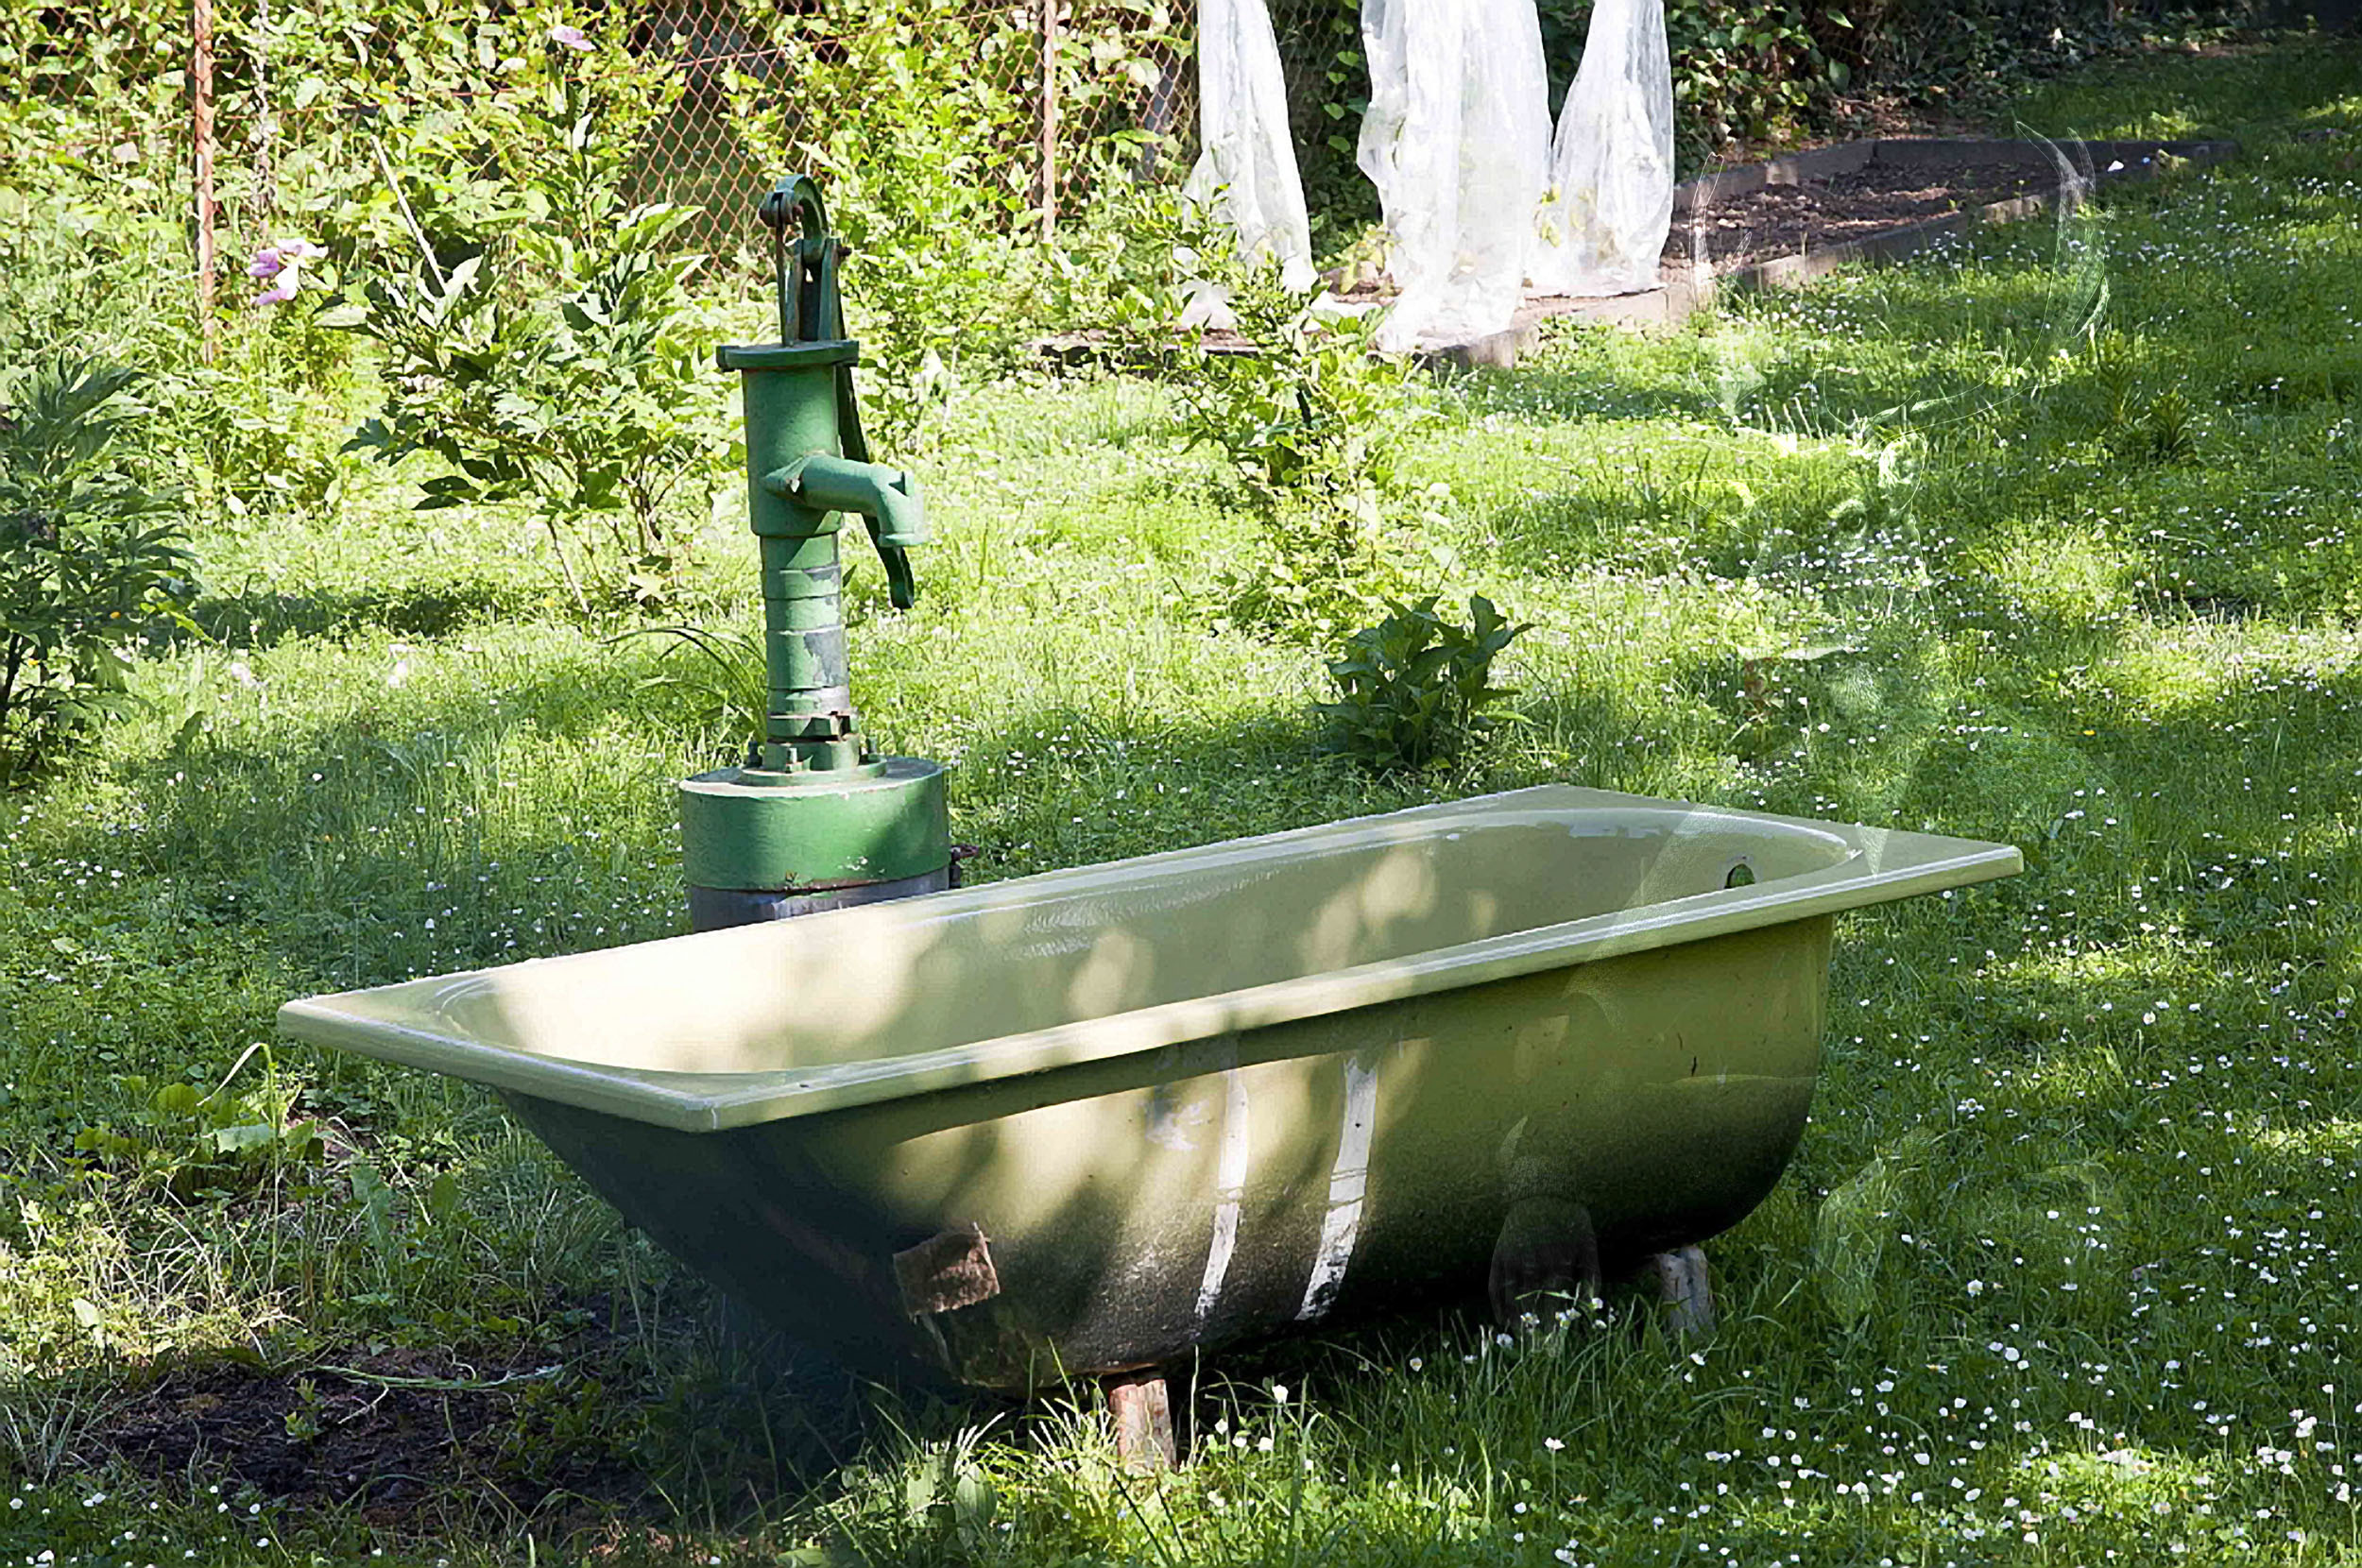 MWD 3; Contest; Garden; Bathlub